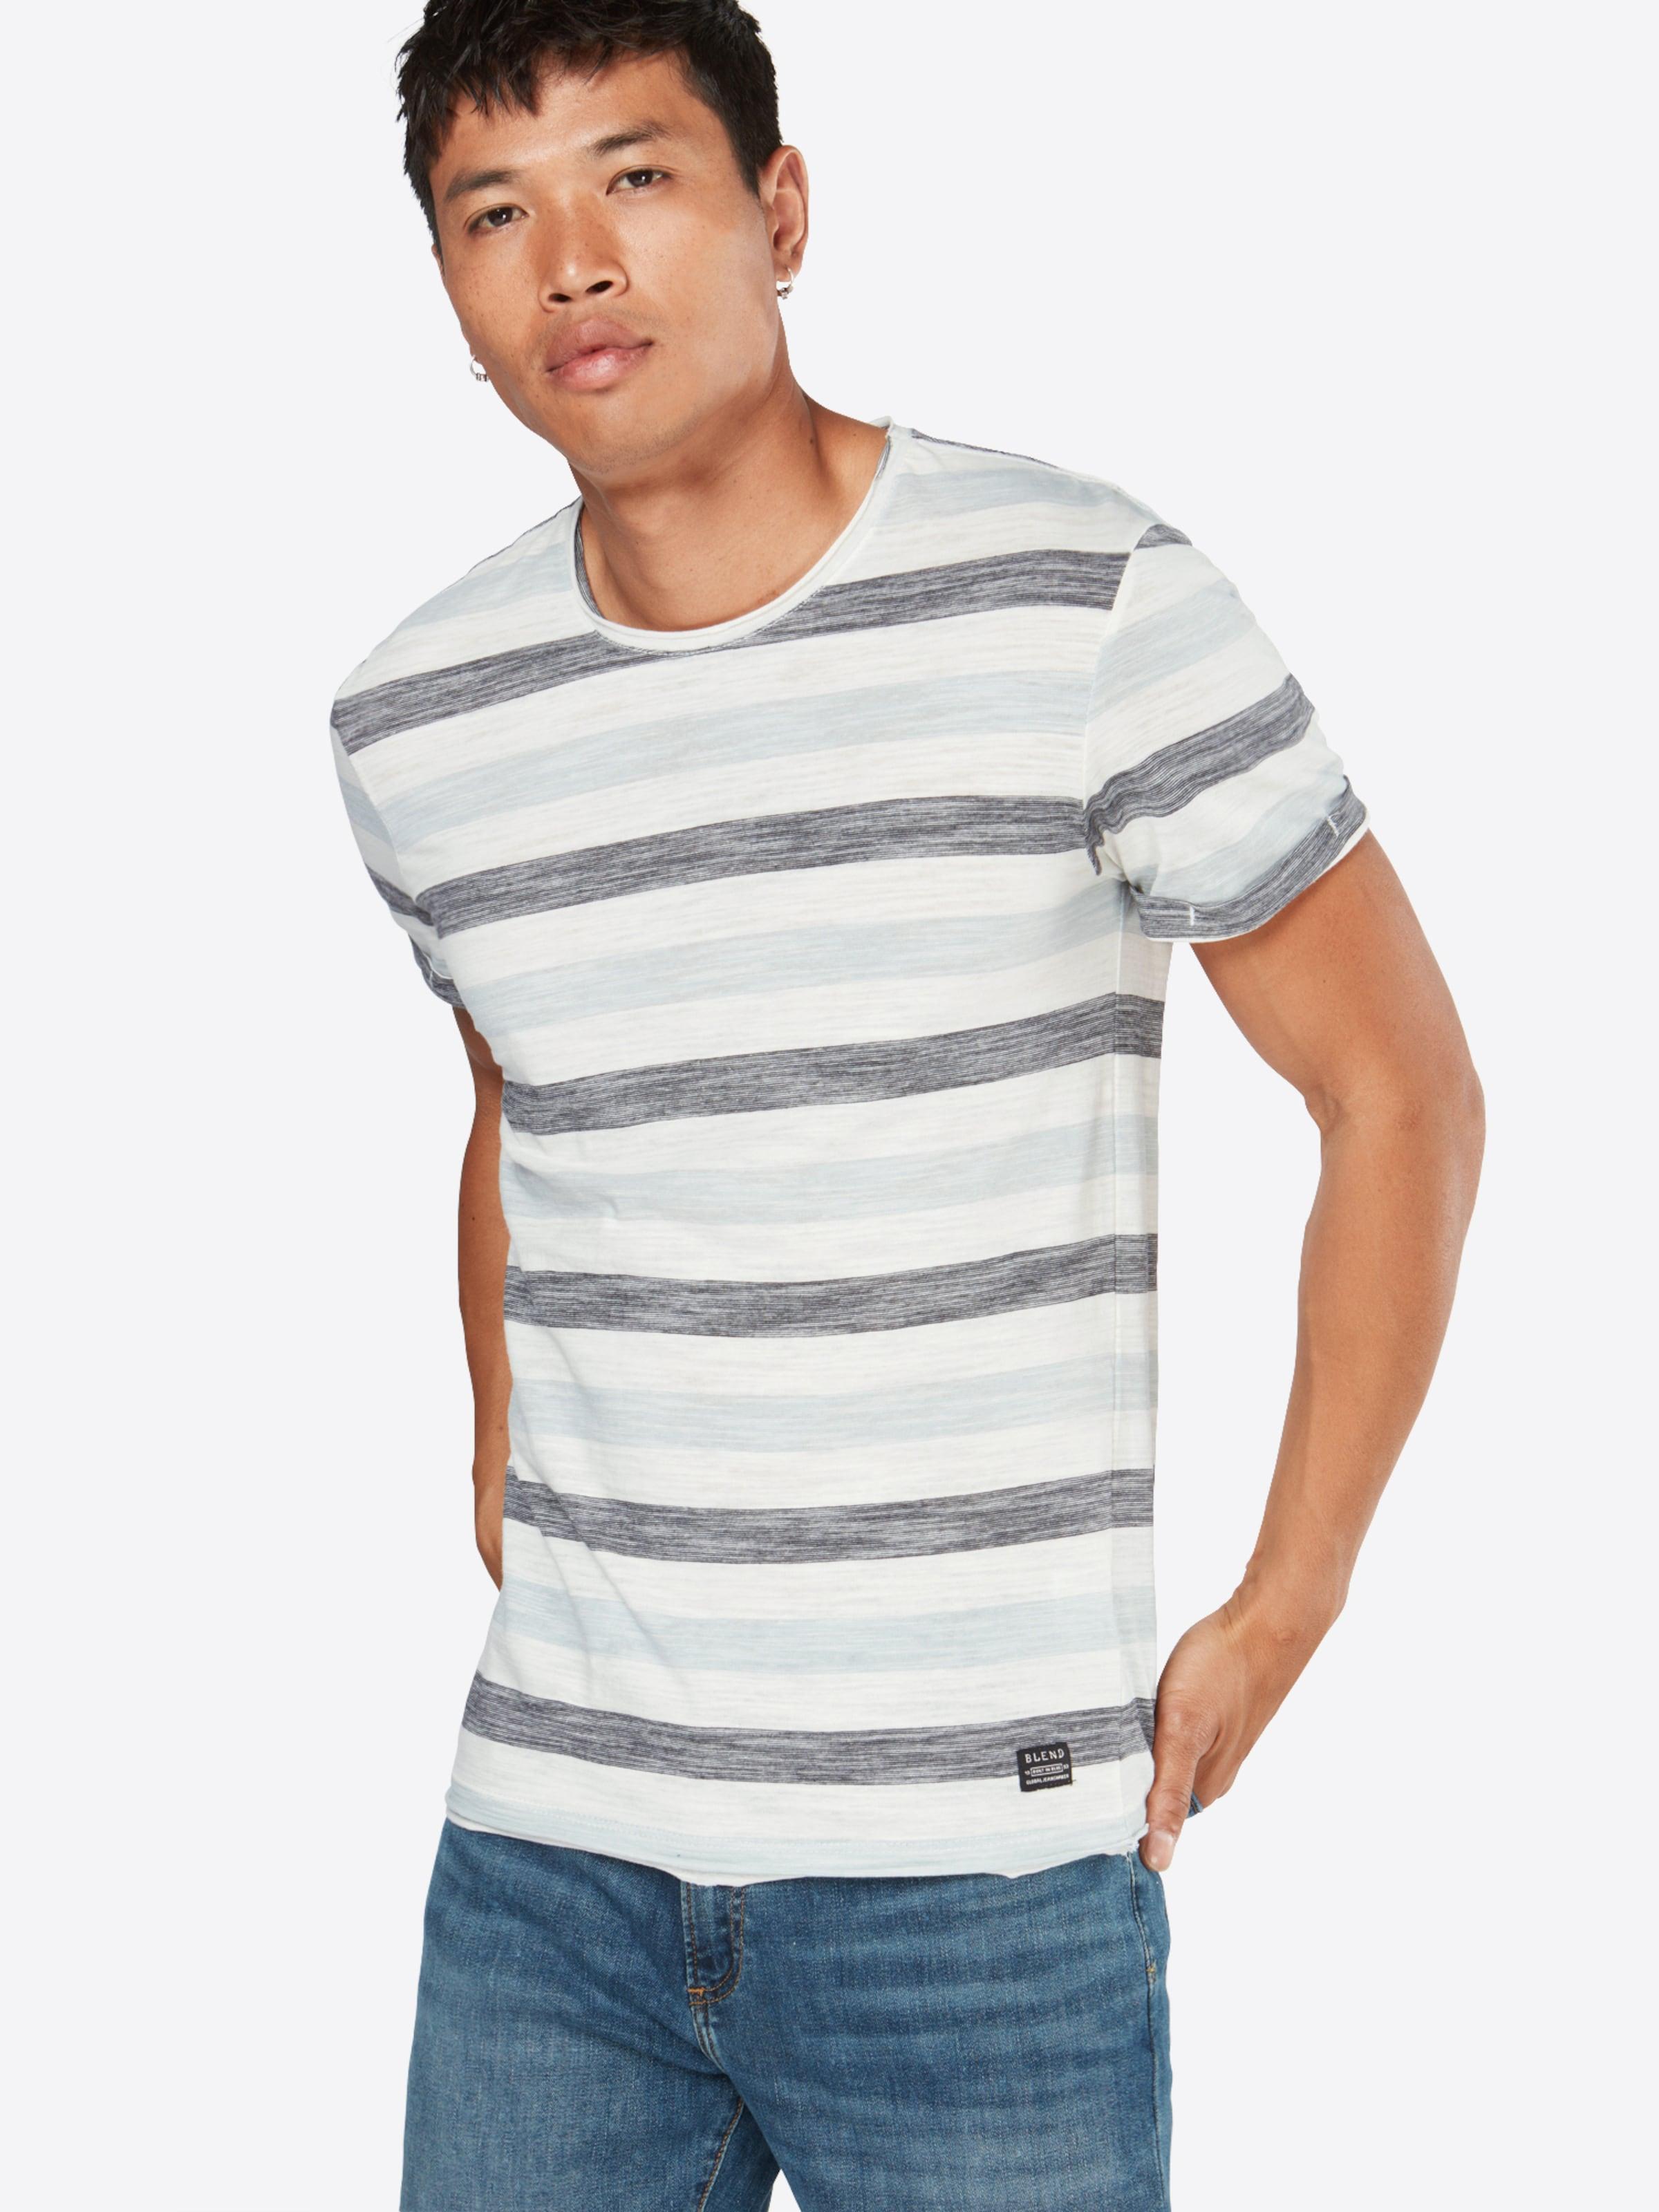 Bleu Blend shirt T Blanc ClairNoir En hQdxBostrC